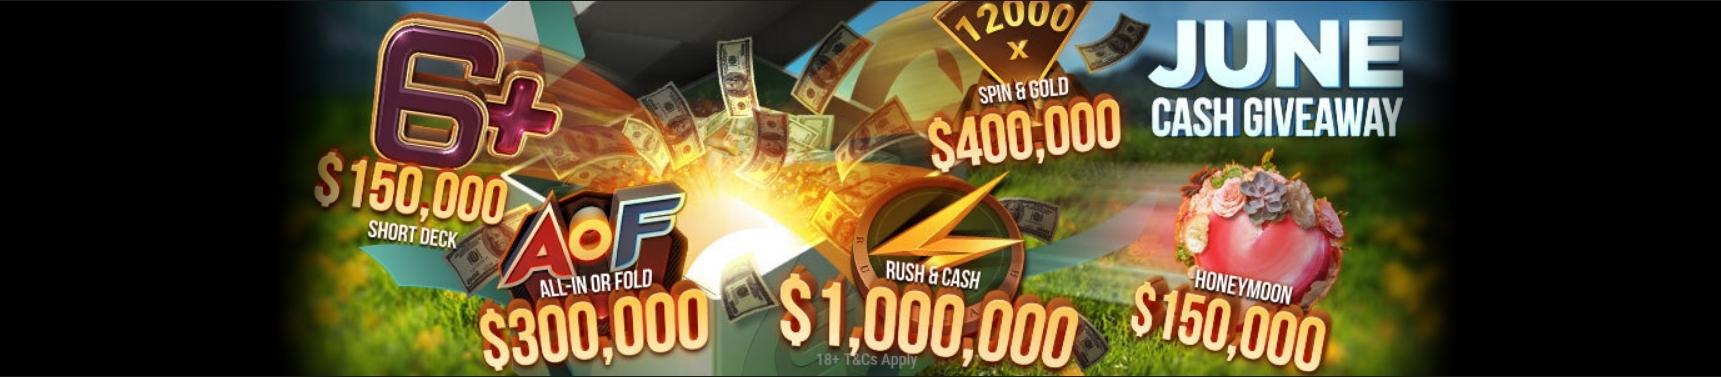 $2,000,000 June Cash Giveaway